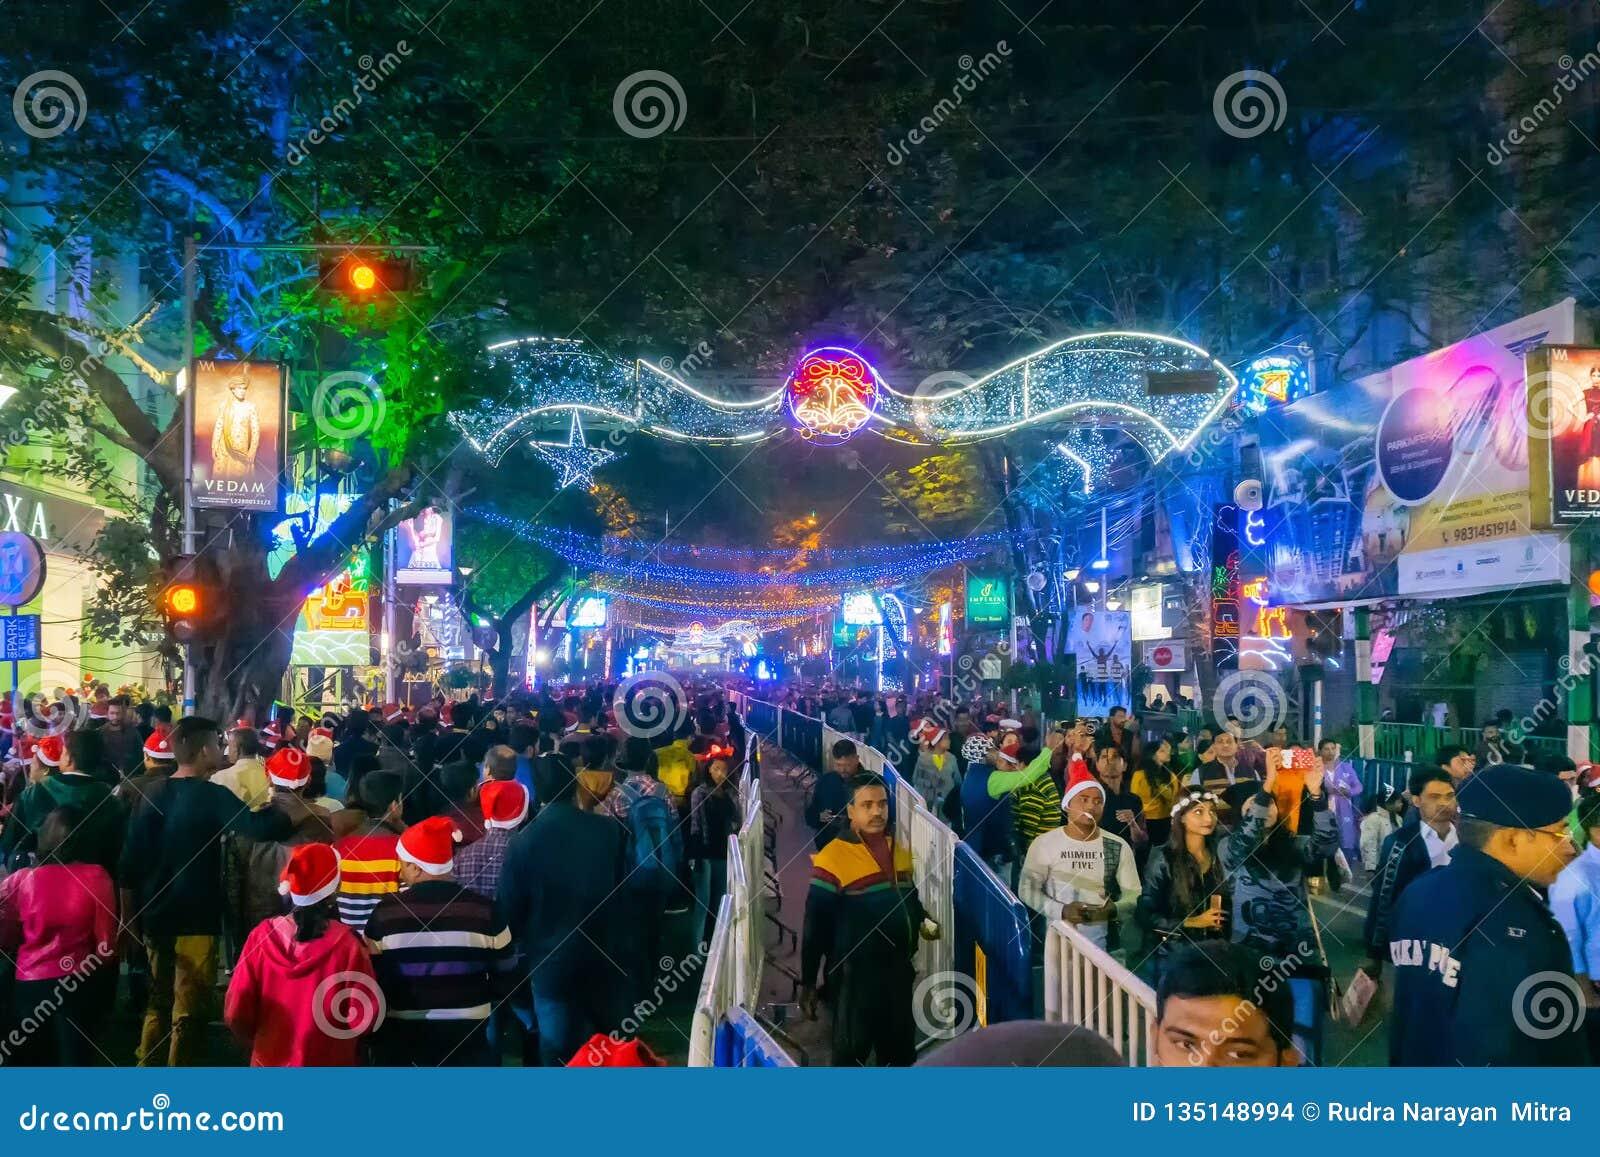 Park Street Kolkata During Christmas.Decorative Lighting At Park Street Kolkata Editorial Stock